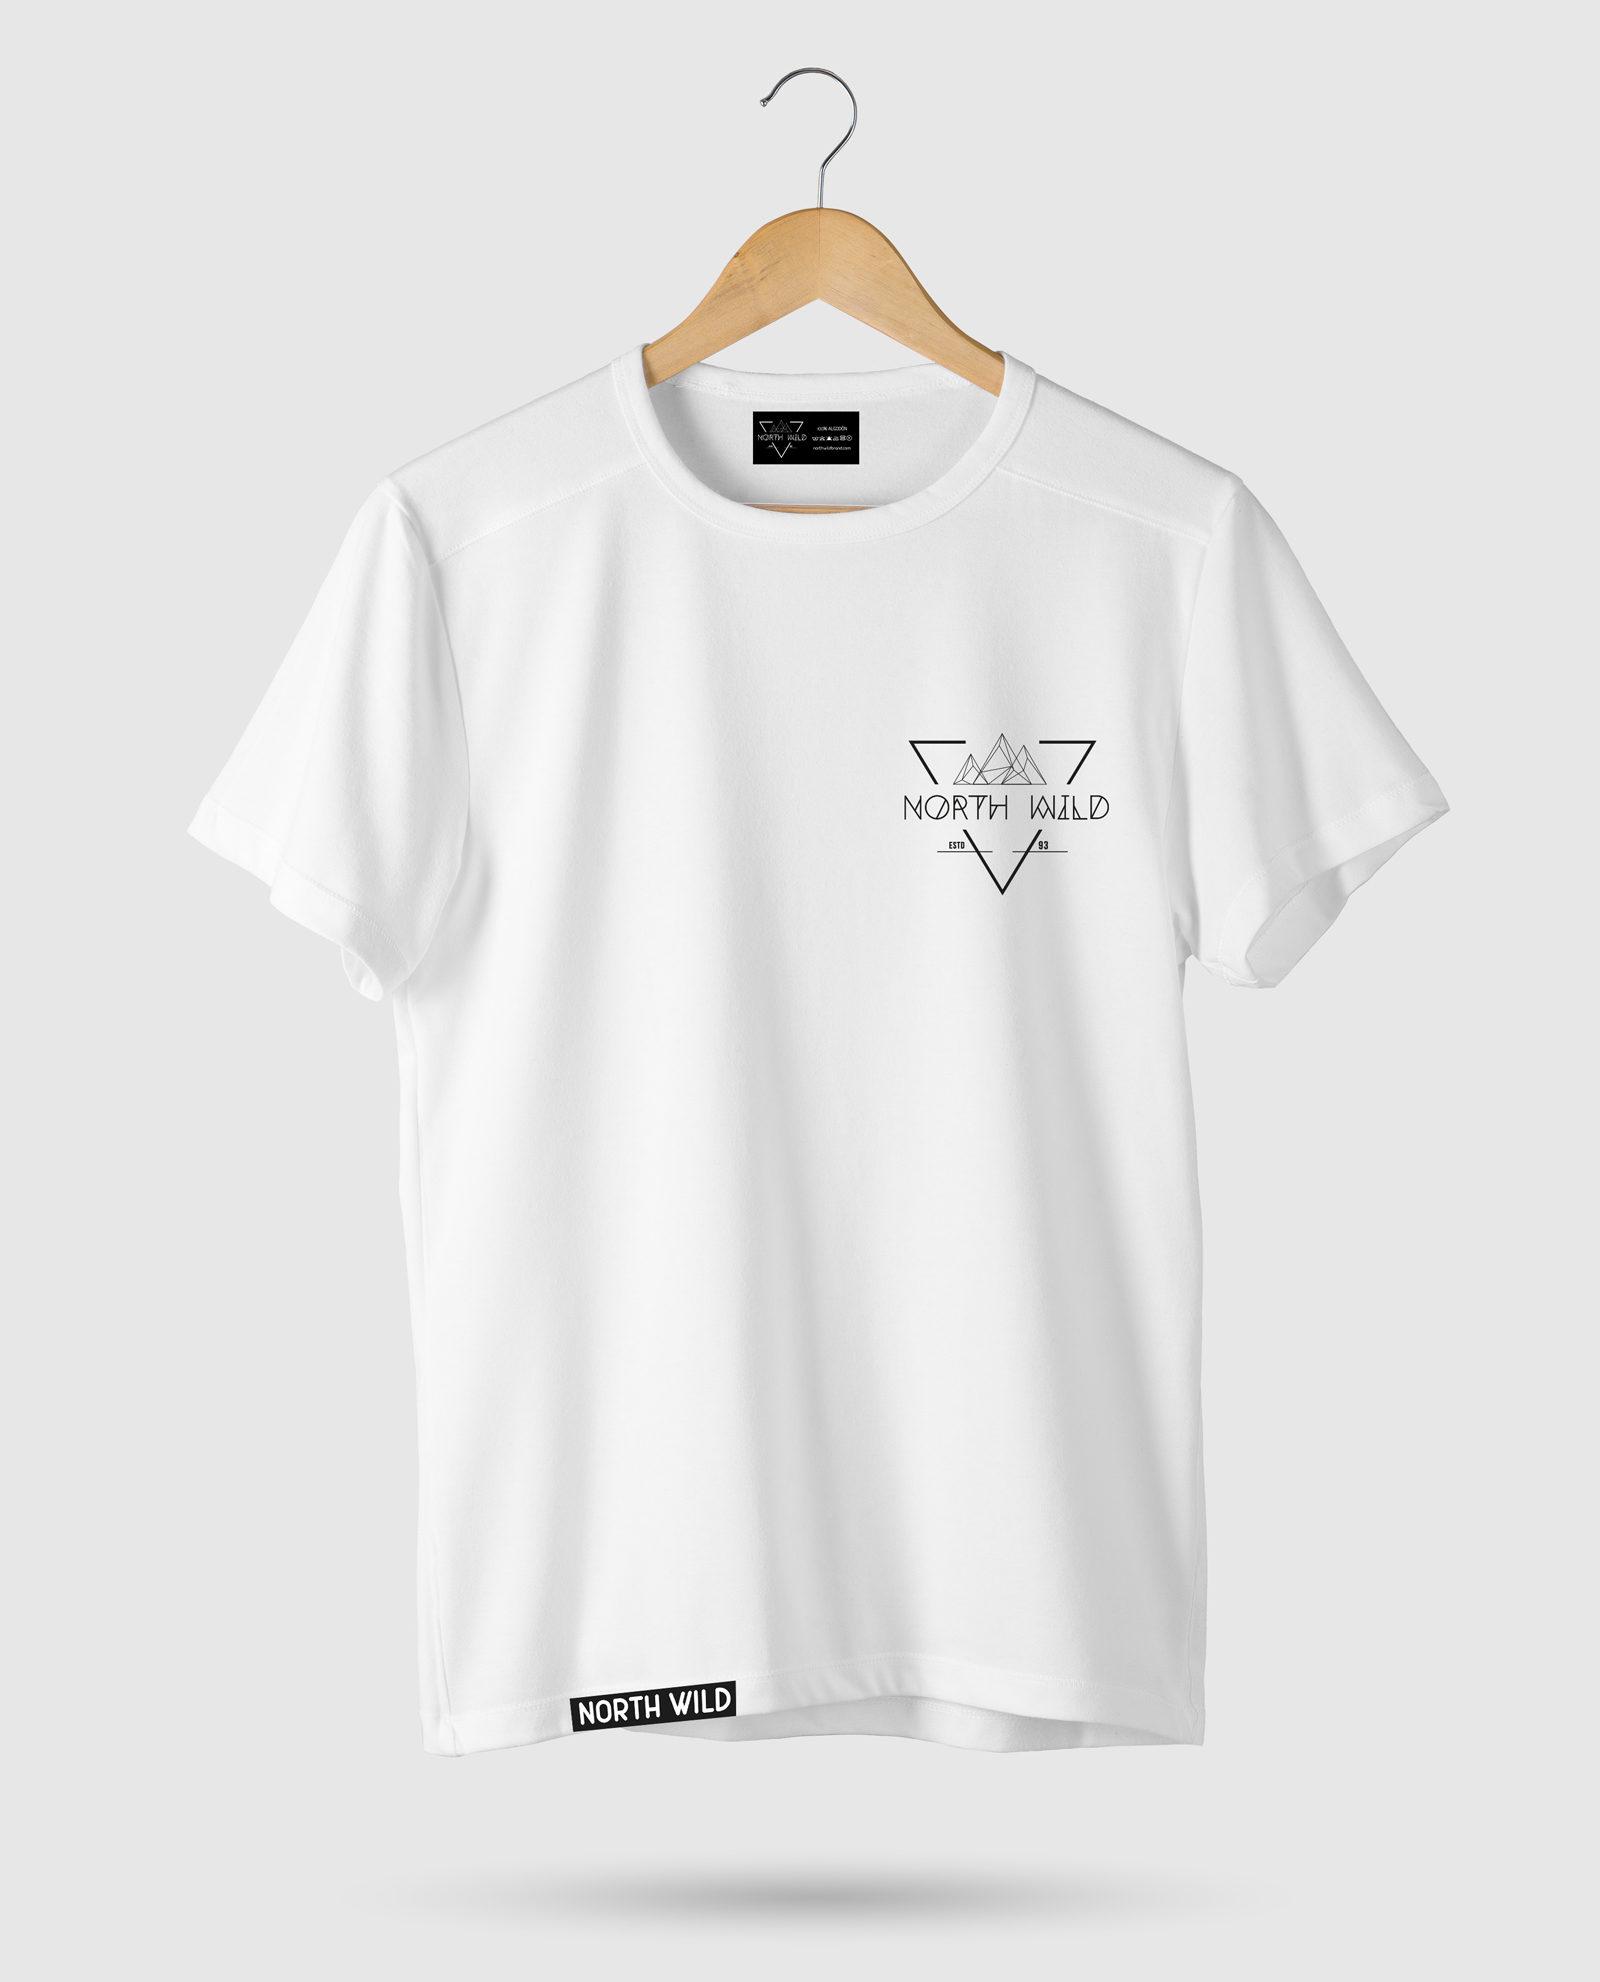 Camisetas básicas Northwild